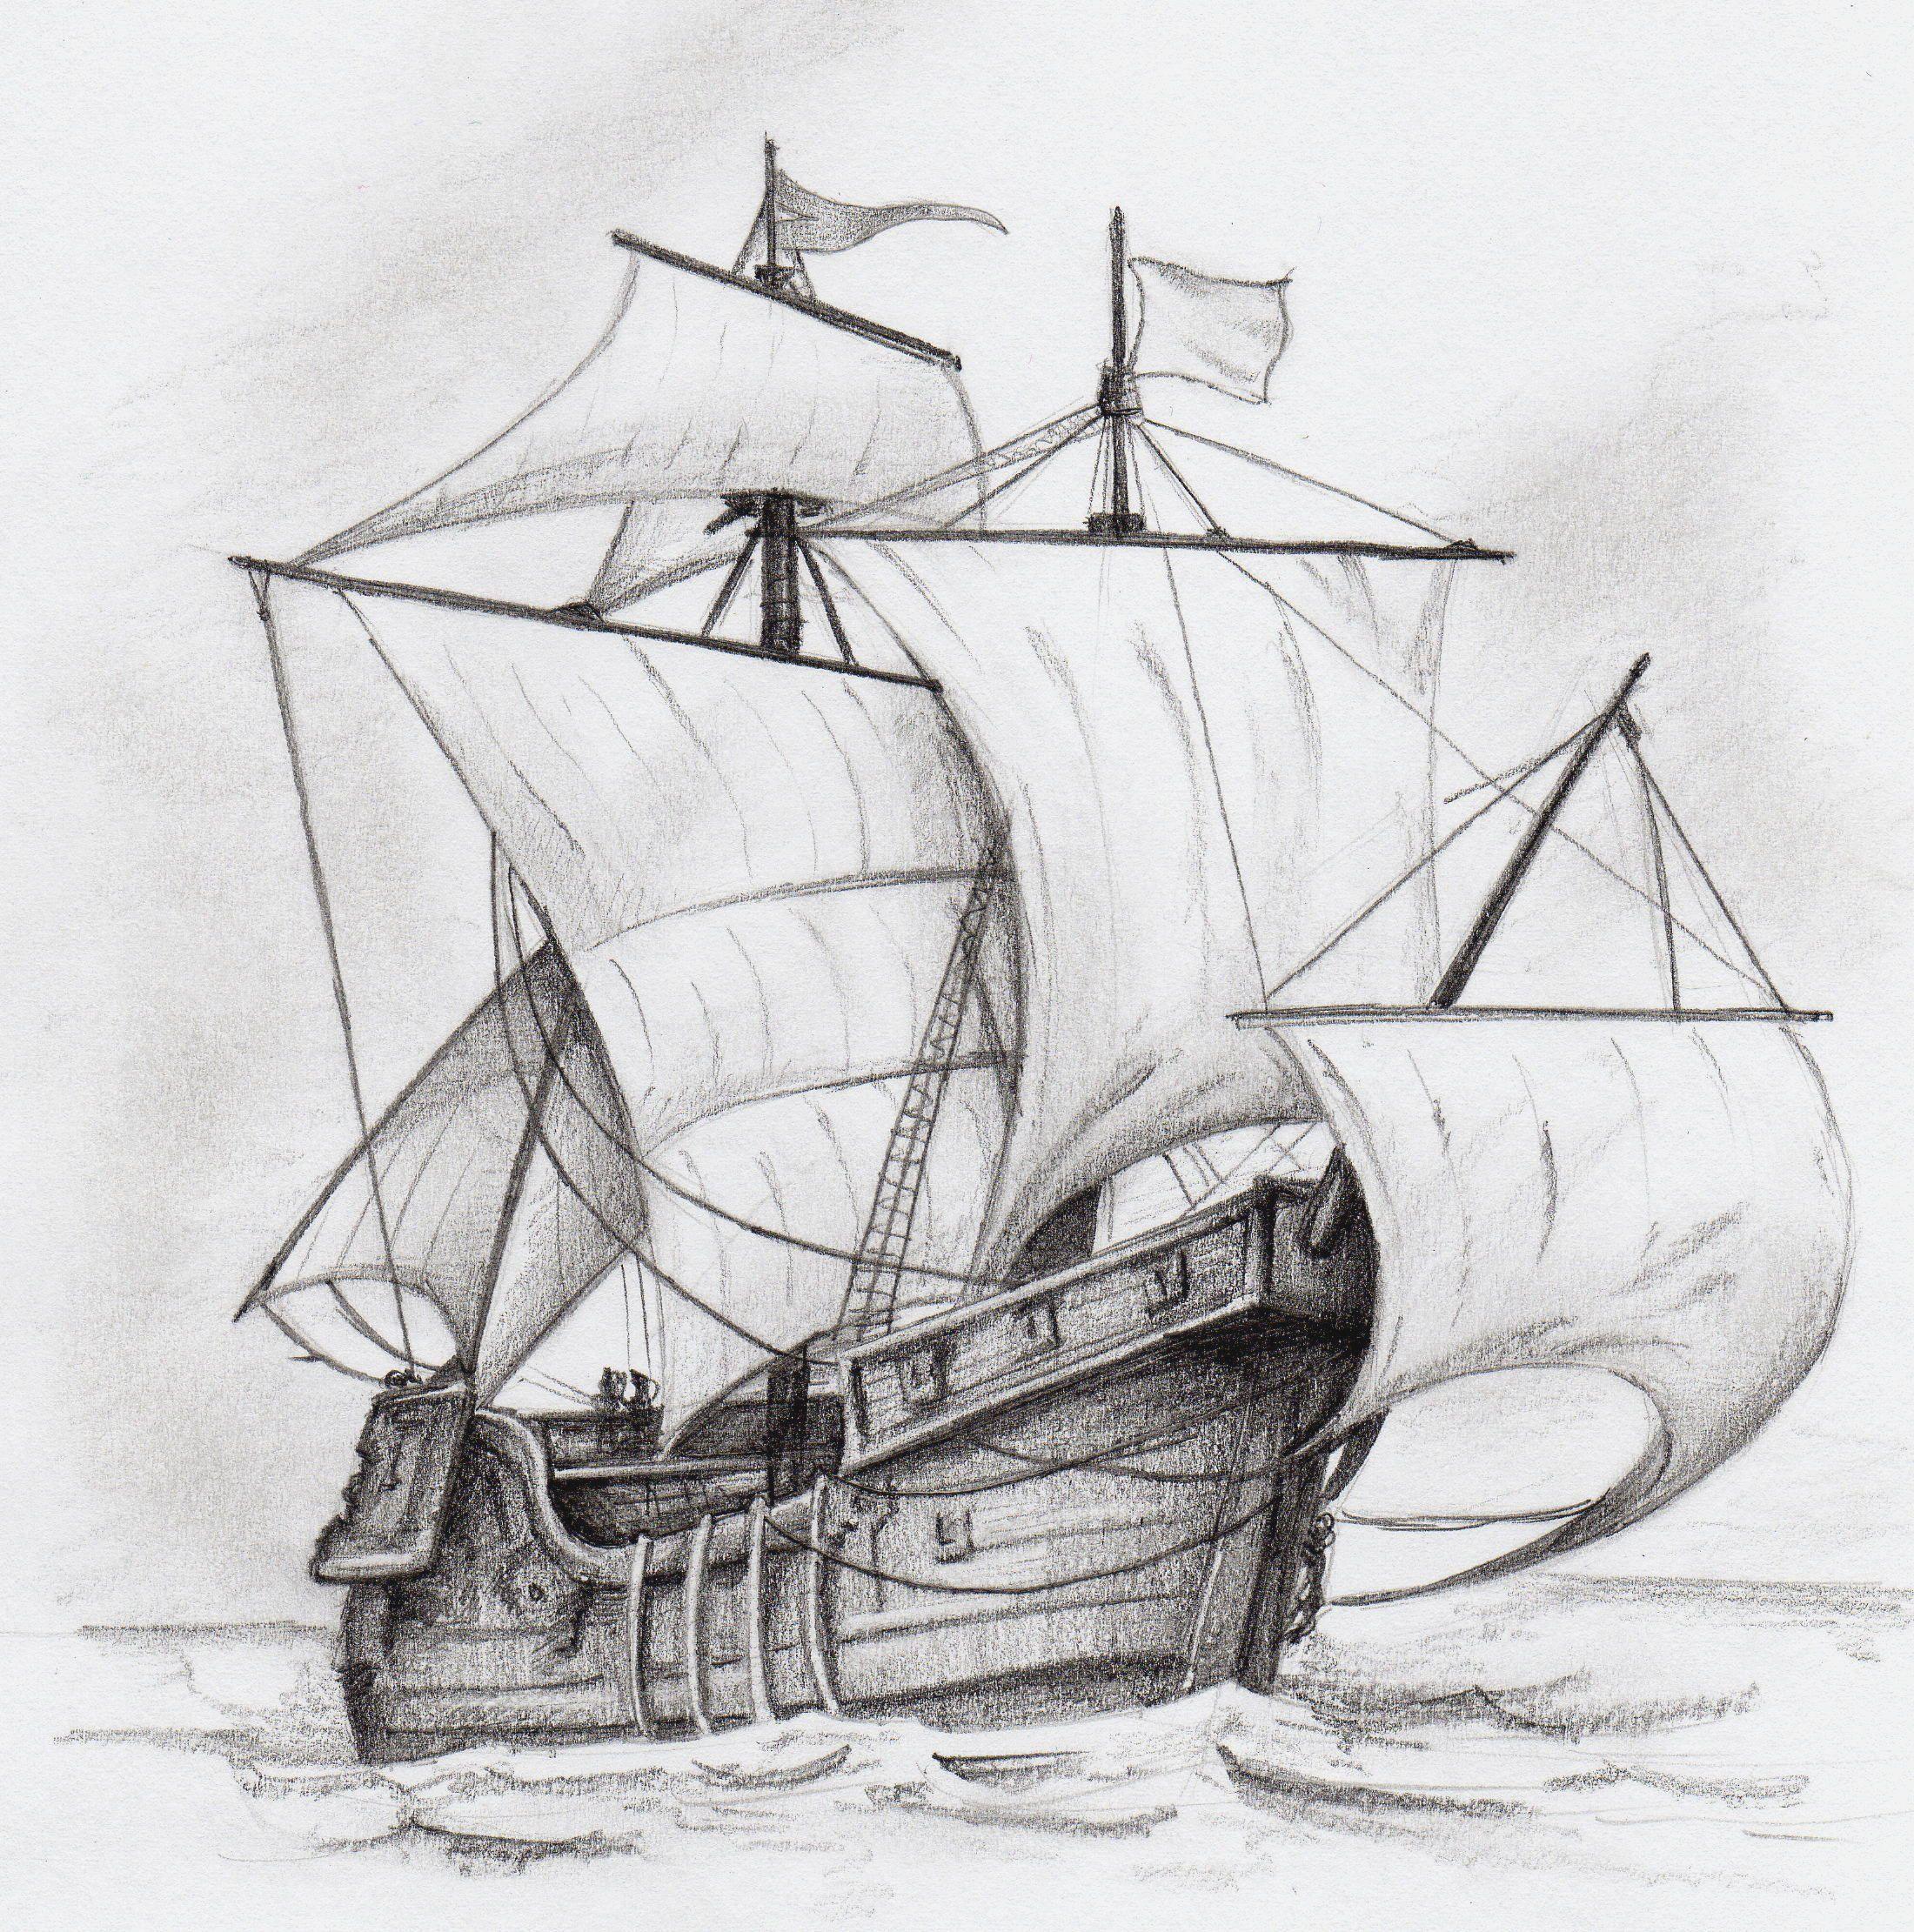 Possible Tattoo Inspiration Favorite So Far Barcos Para Dibujar Dibujo De Barco Tatuajes De Barcos